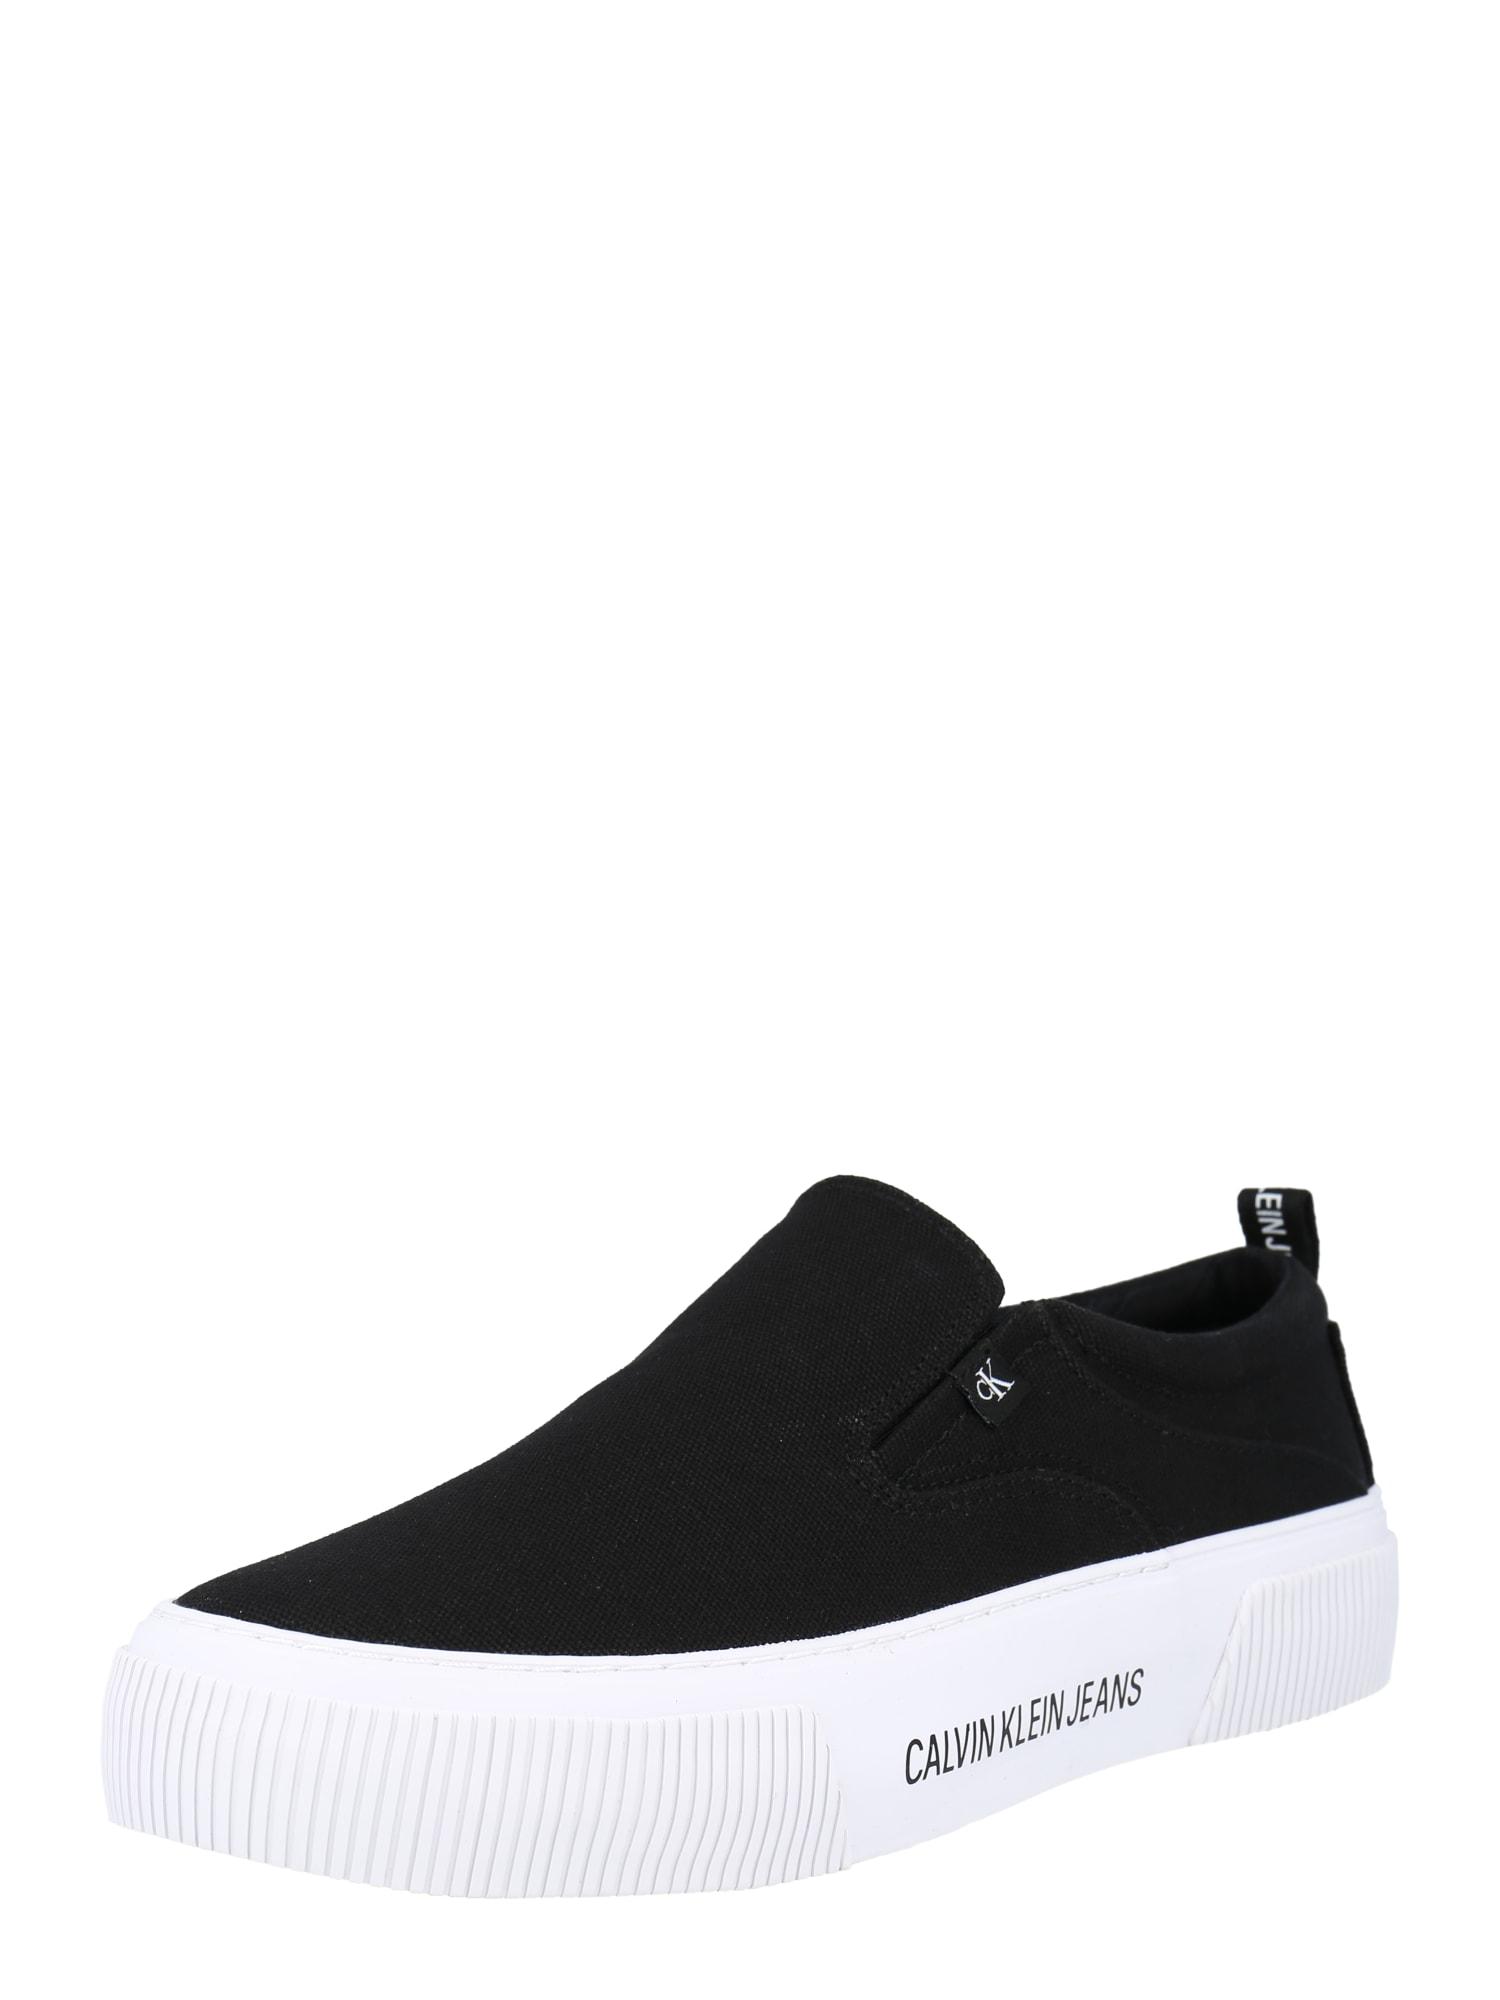 Calvin Klein Jeans Slip on boty  černá / bílá